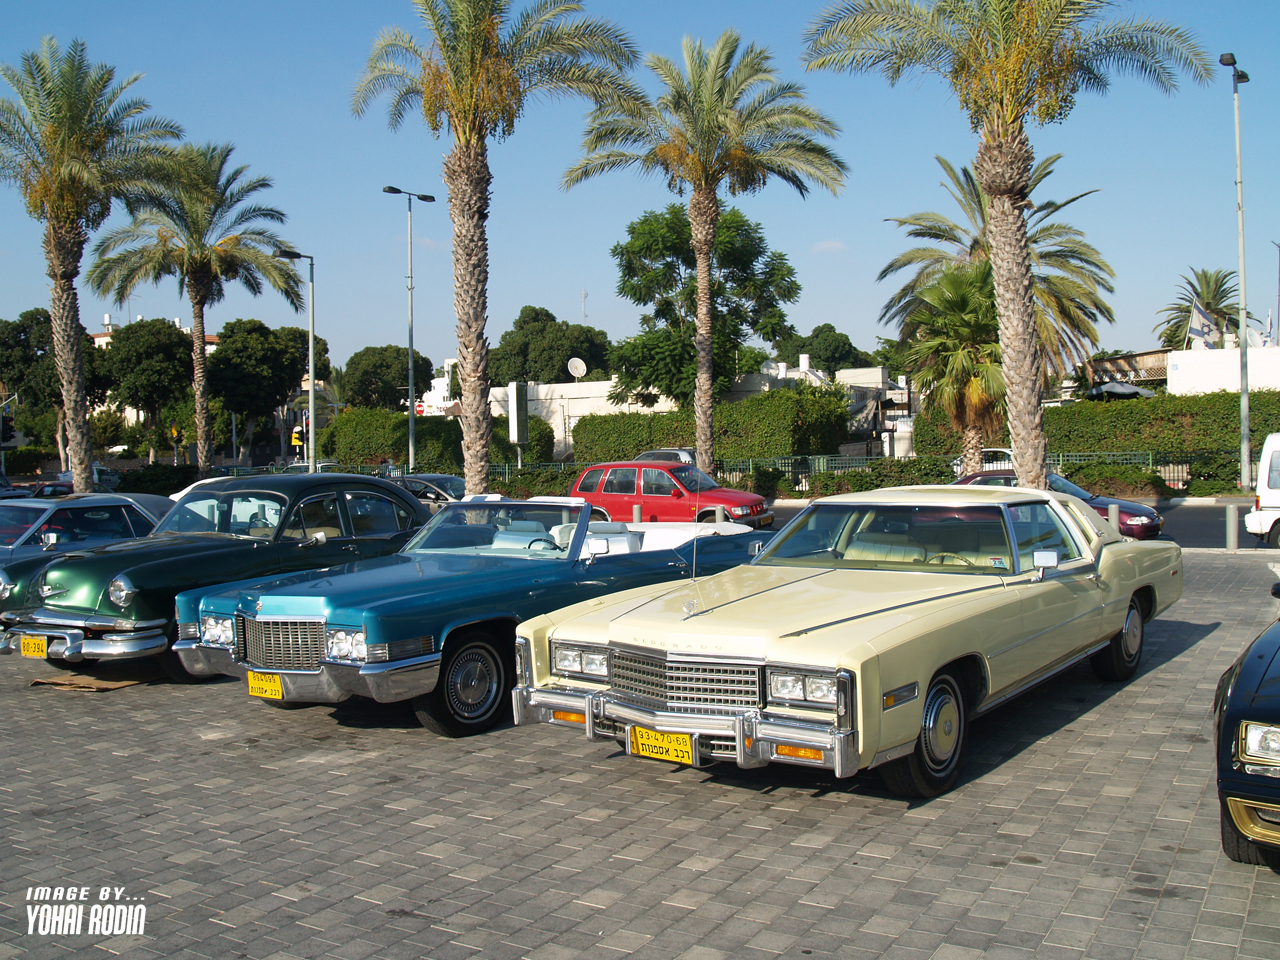 1978 Cadillac Eldorado Biarritz 1970 Deville Convertible Sedan